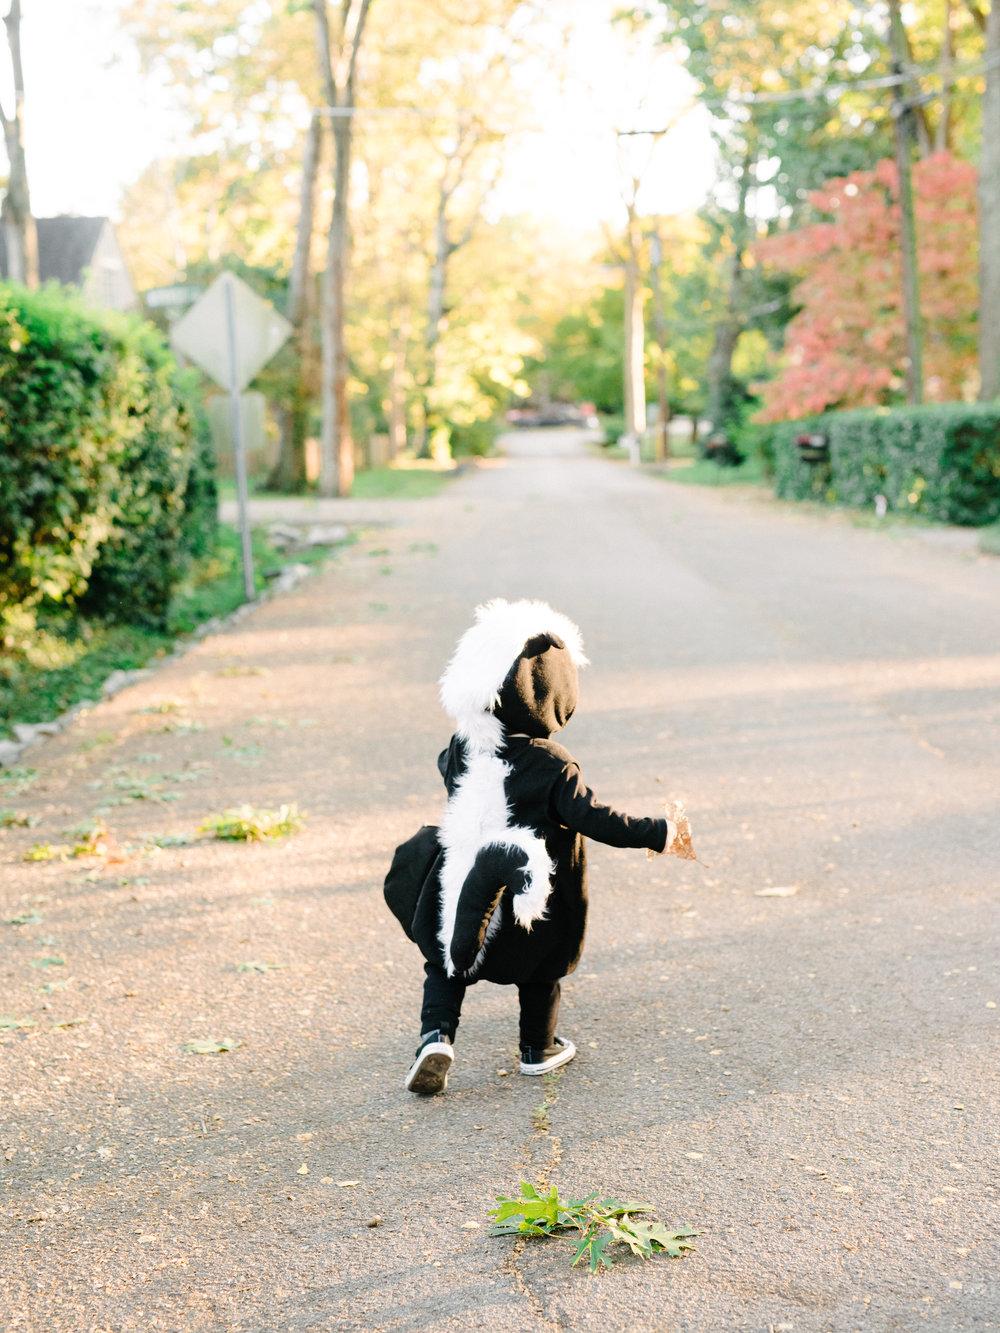 Pottery Barn Kids Skunk Costume